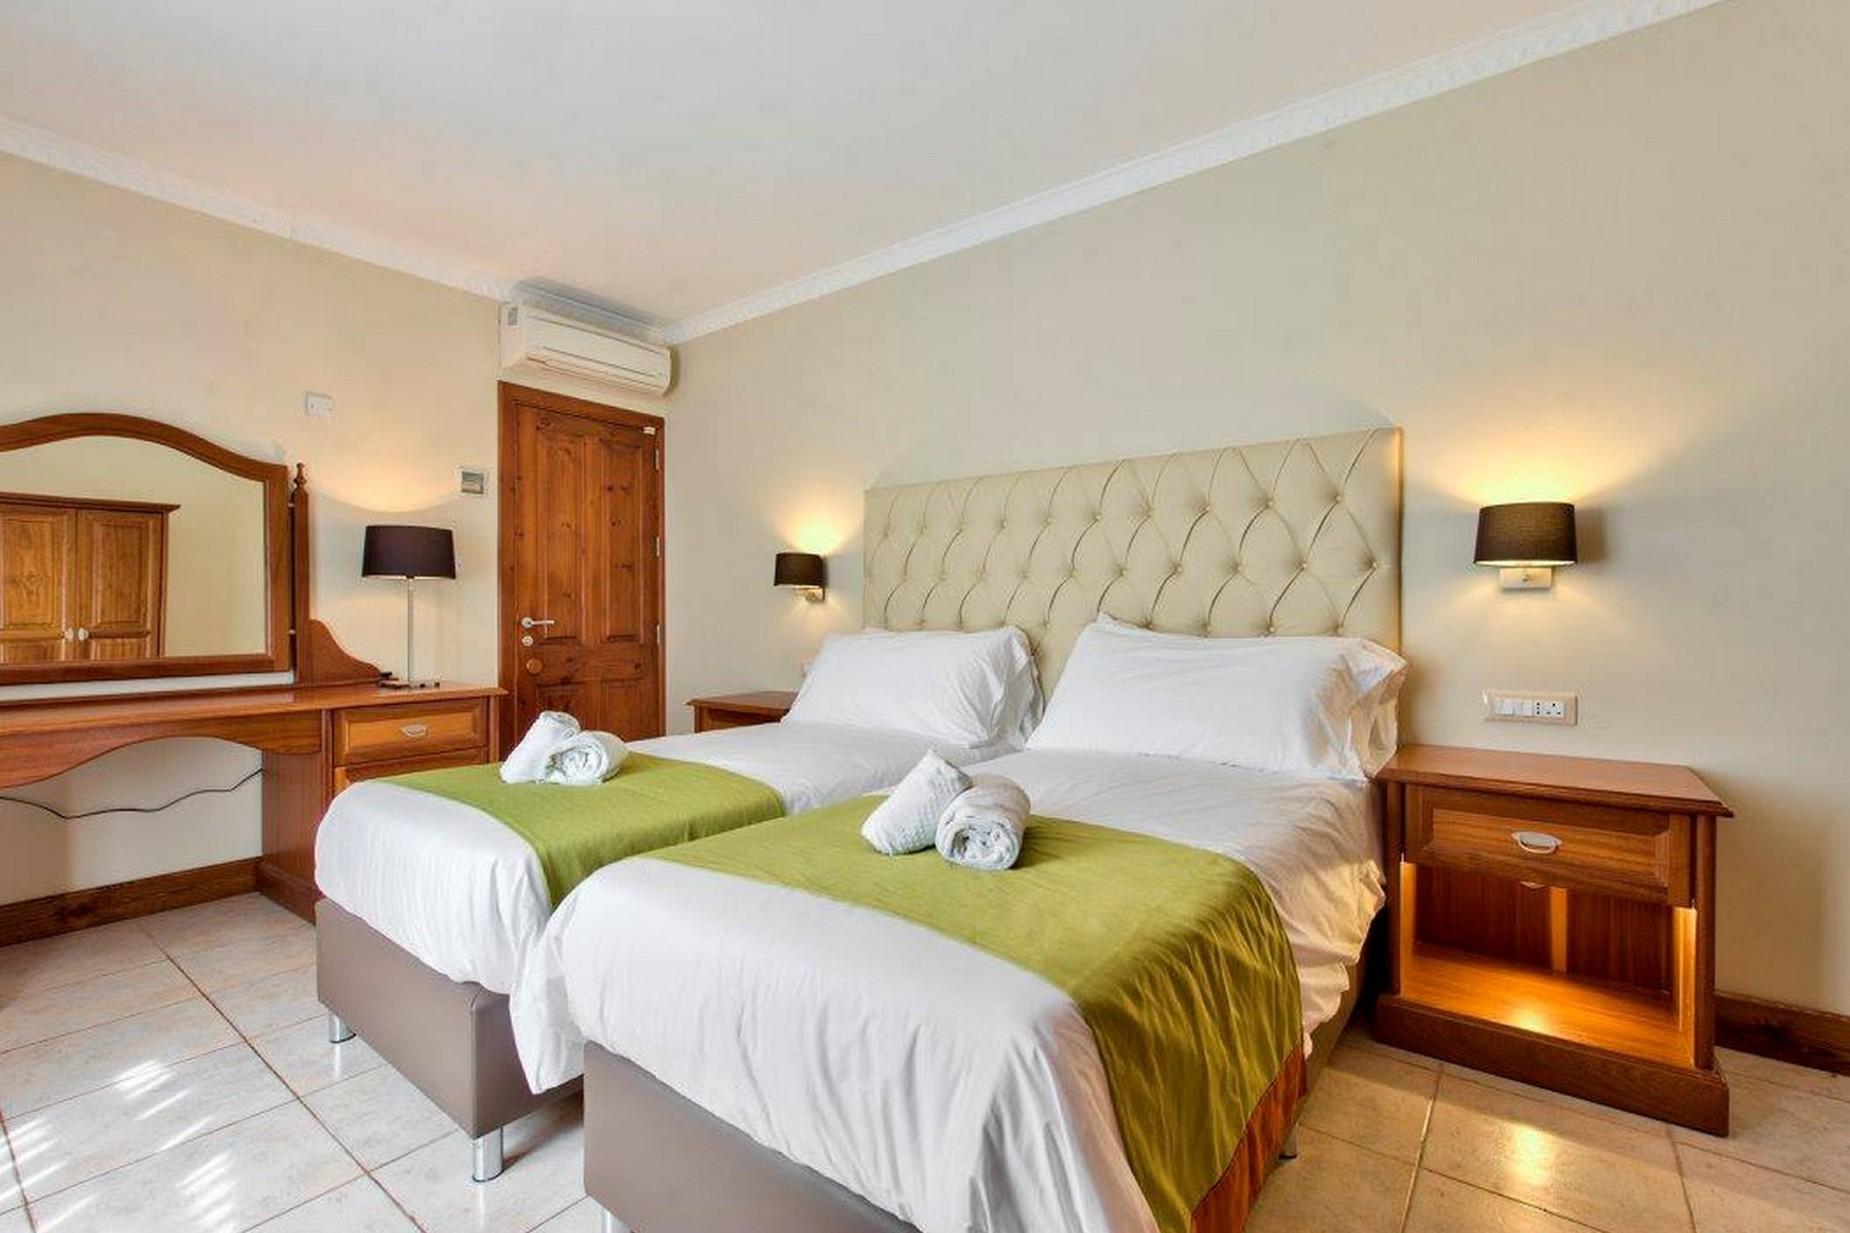 3 bed Villa For Rent in Mellieha, Mellieha - thumb 12